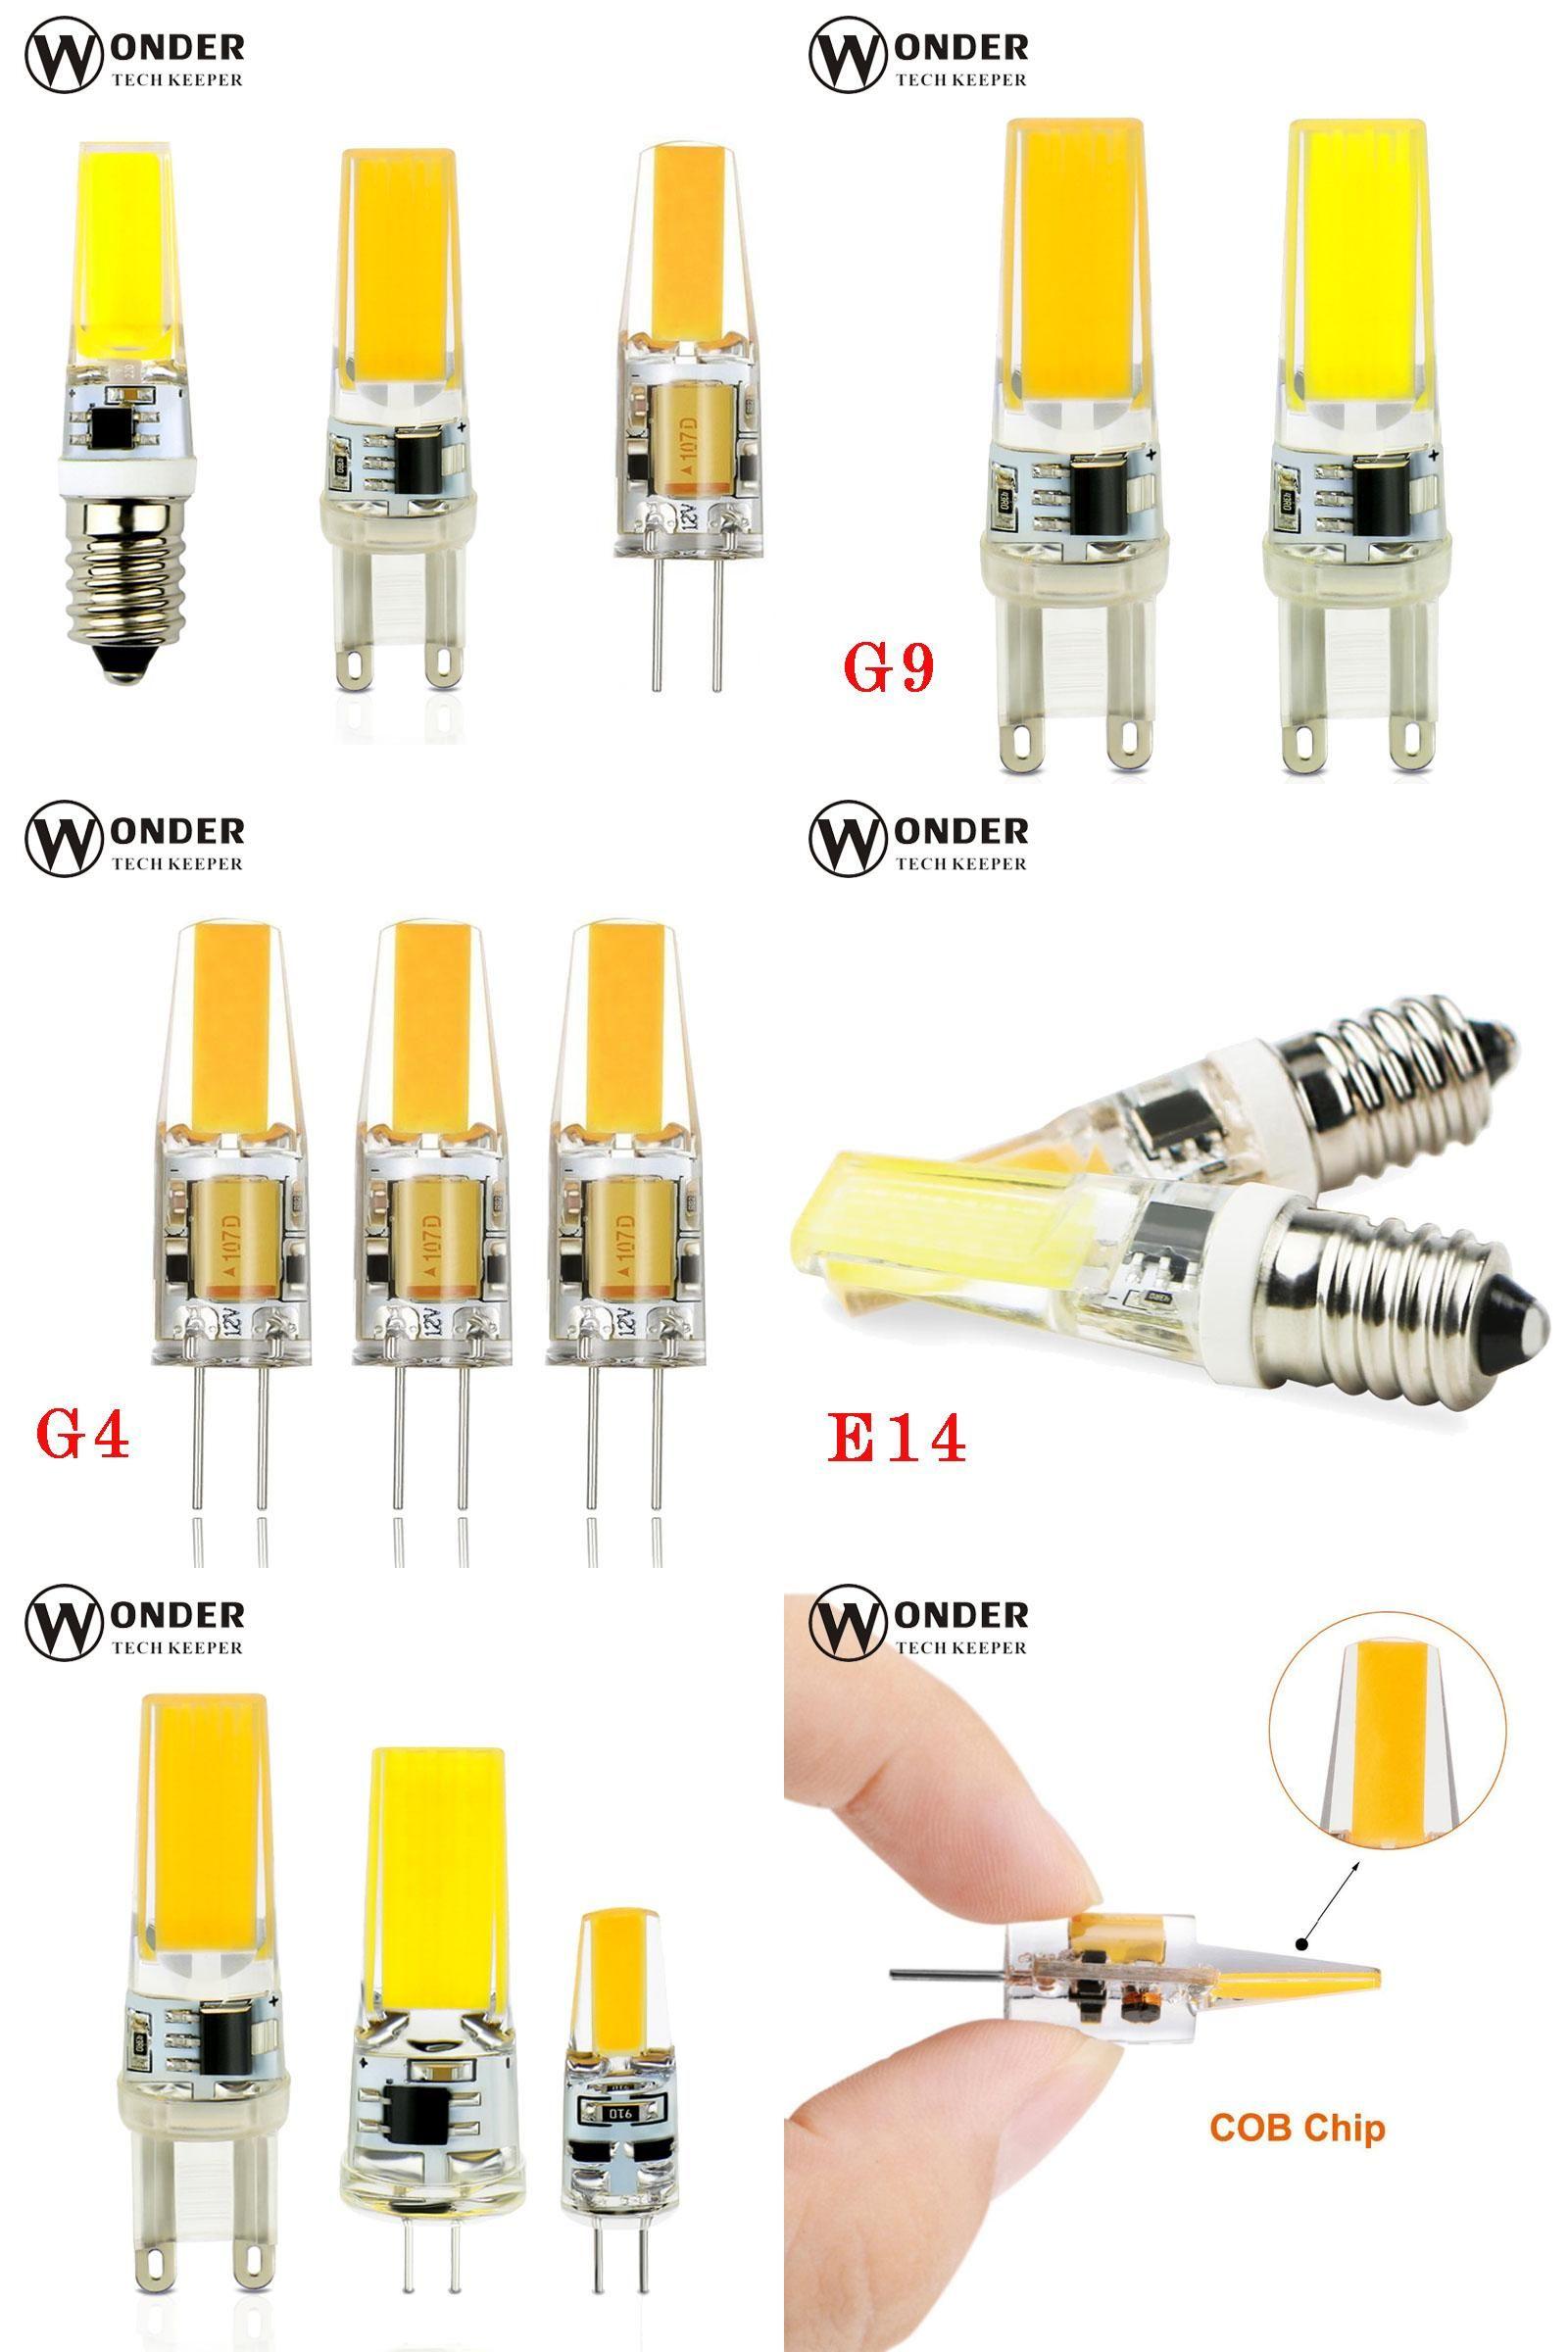 Visit to buy mini led g4 cob lamp g9 e14 cob bulb acdc12v ac220v visit to buy mini led g4 cob lamp g9 e14 cob bulb acdc12v ac220v bulbs chandeliers aloadofball Image collections